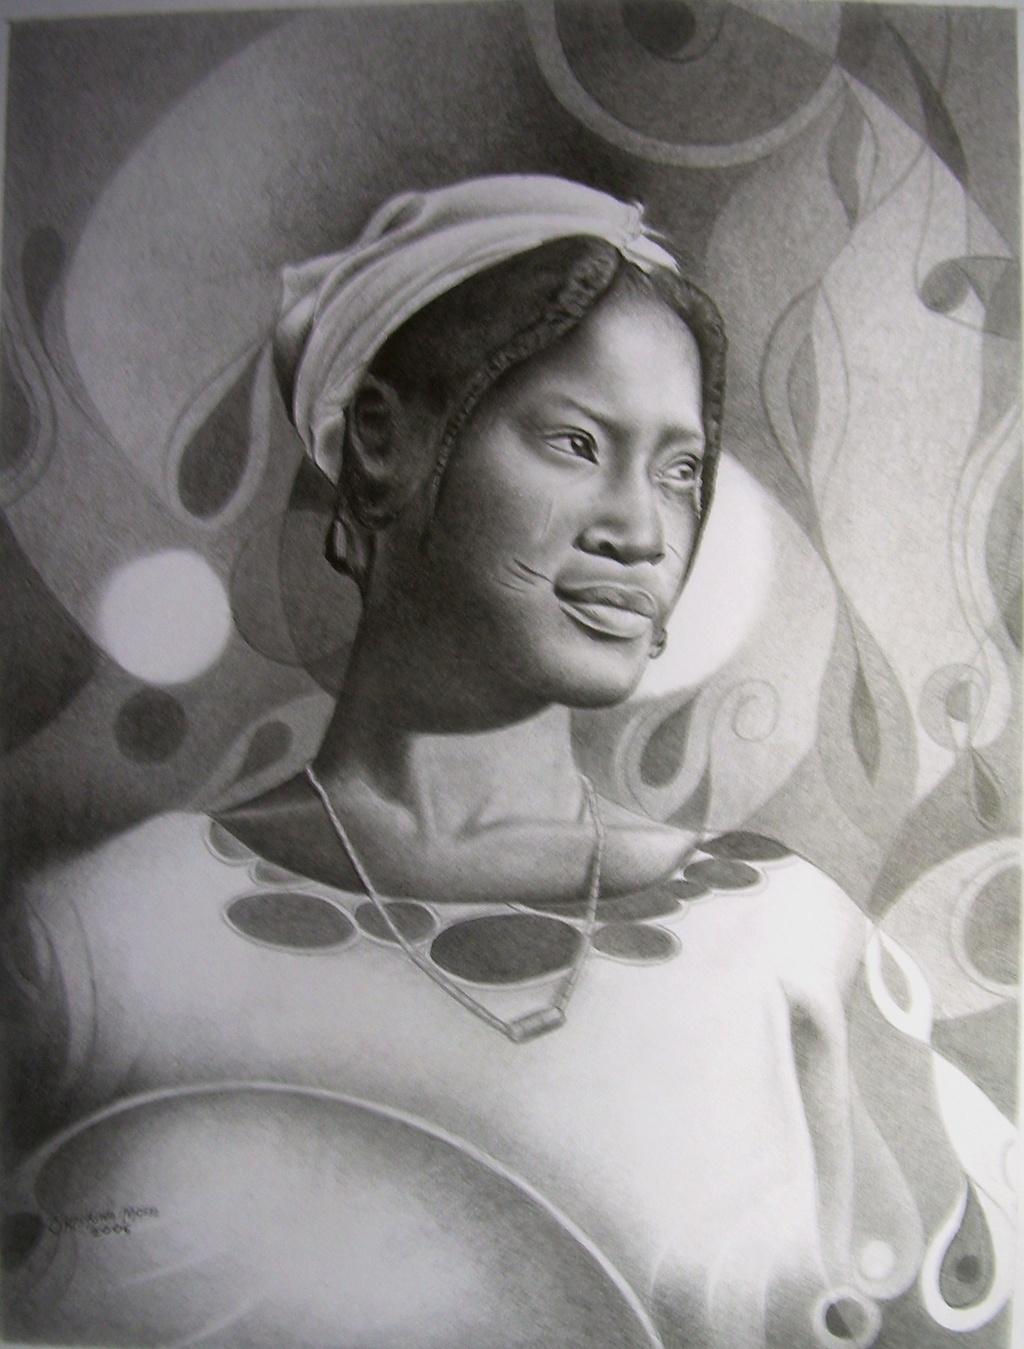 Moses marquis okpeyowa aisha fulani girl 2007 pencil drawing abstract figurative